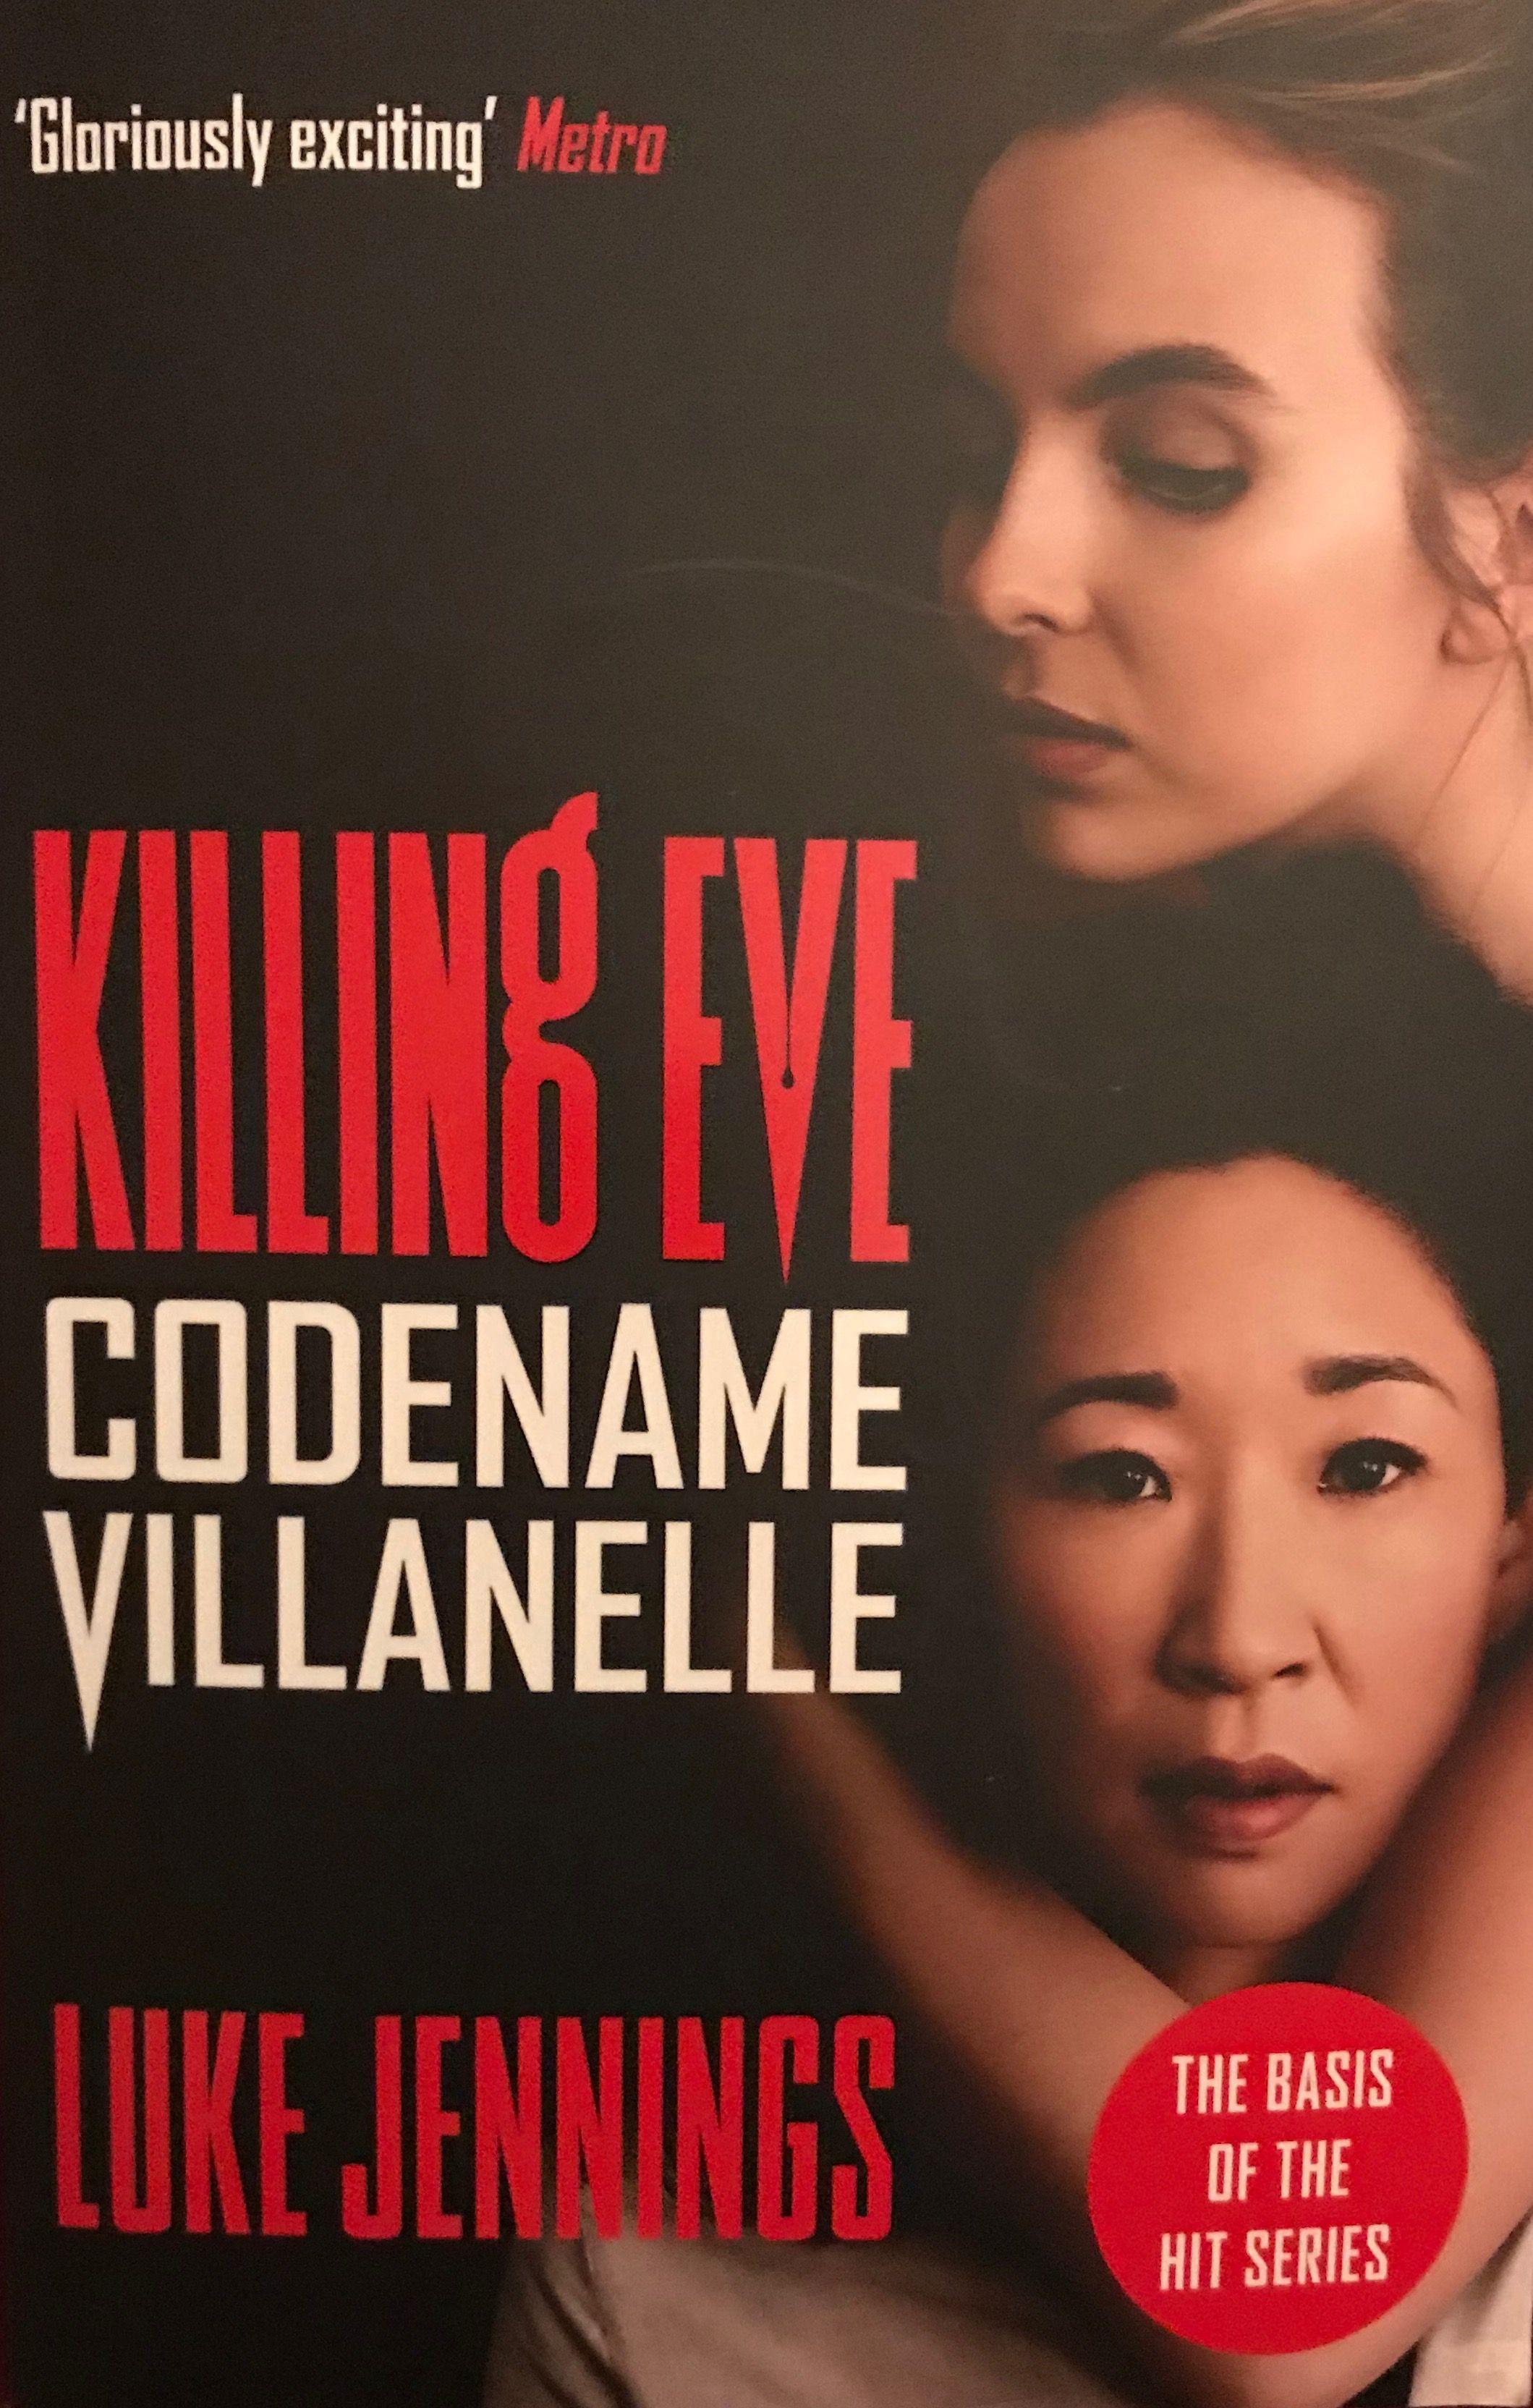 Codename Villanelle : the basis of Killing Eve